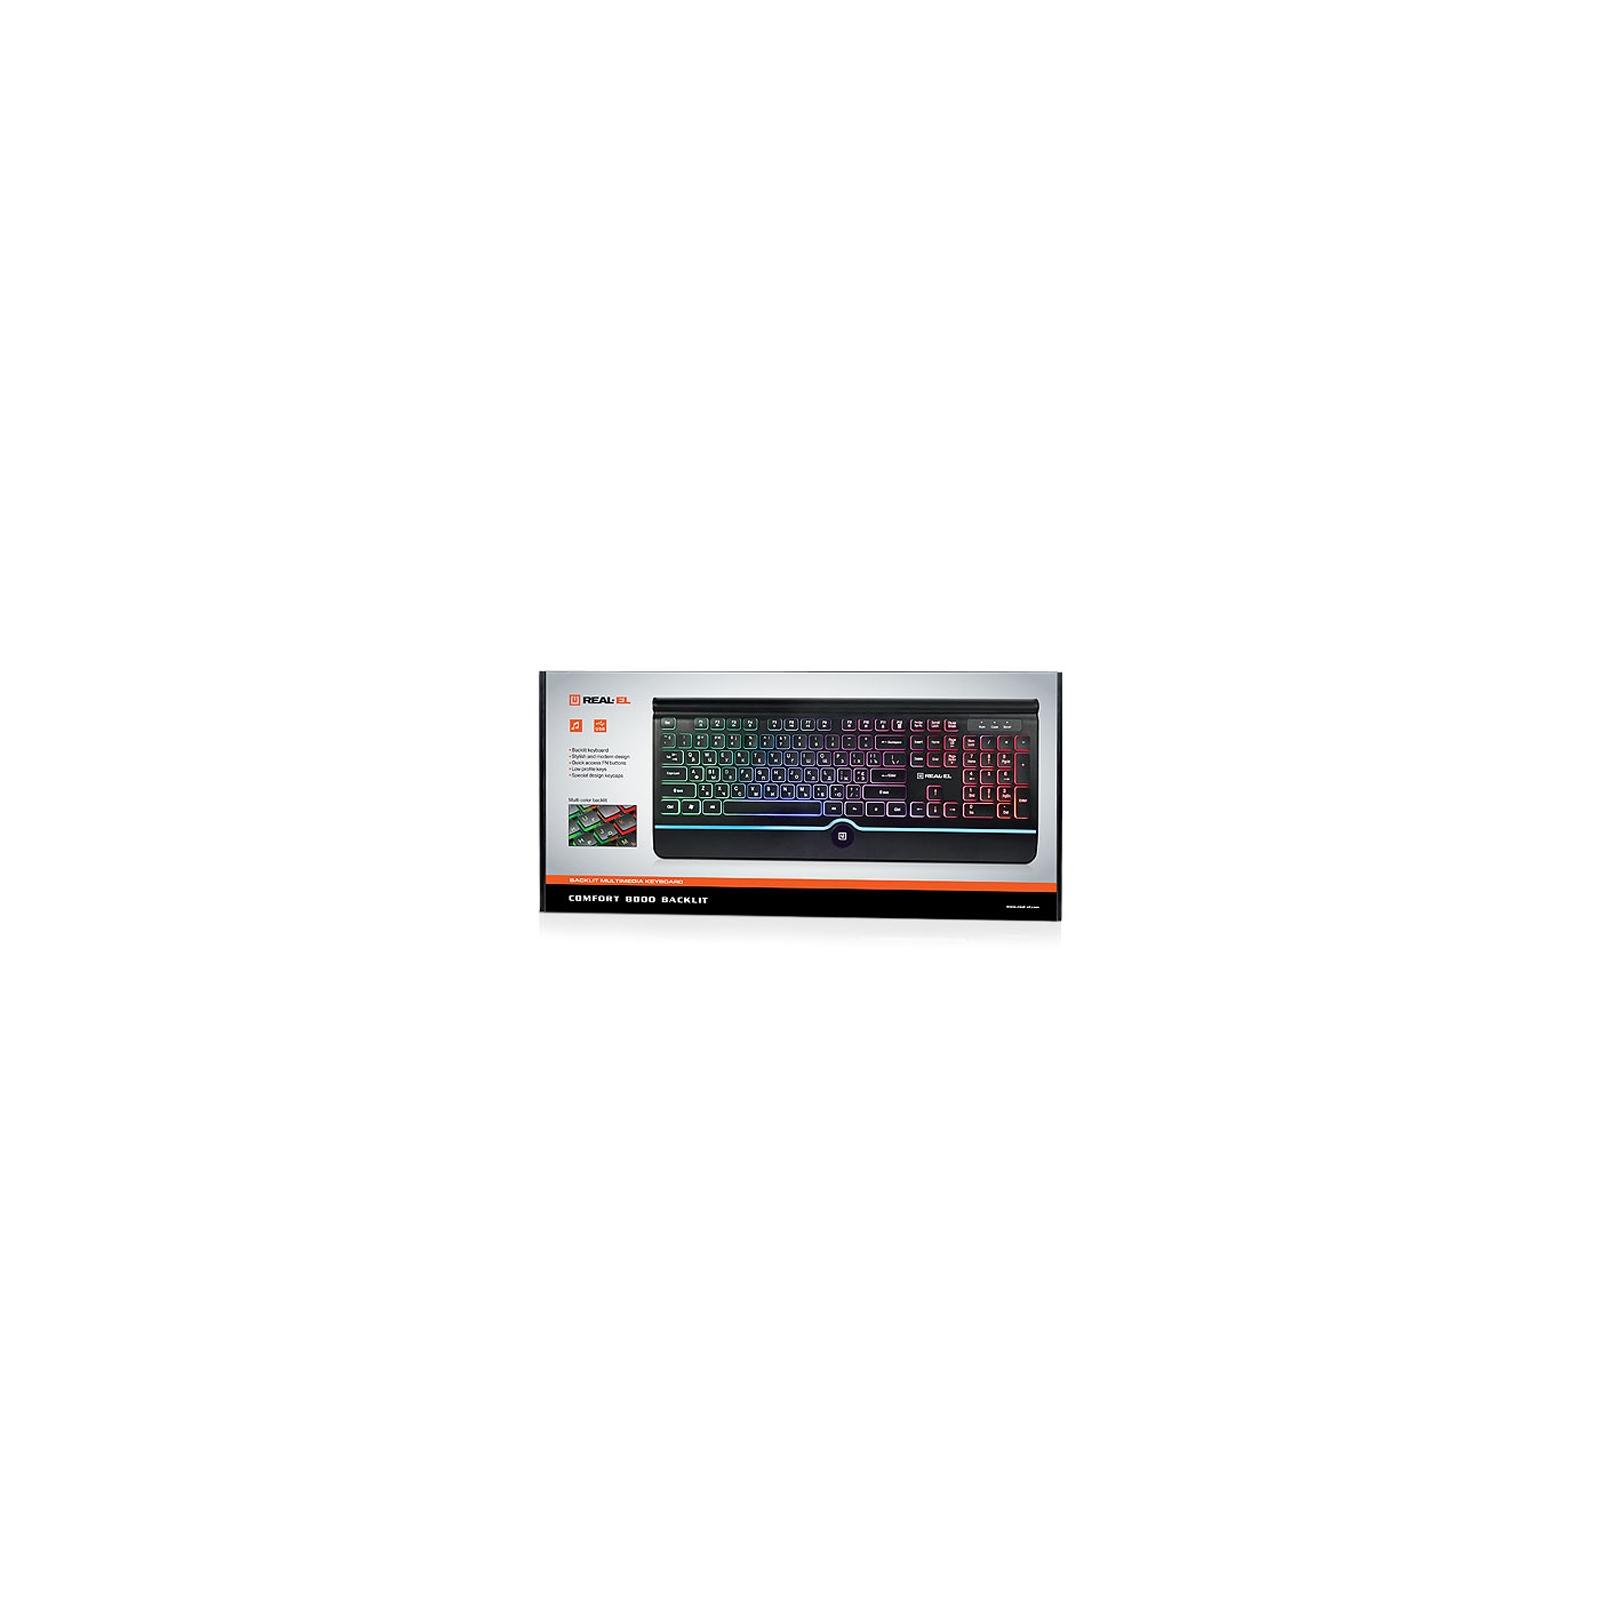 Клавіатура REAL-EL 8000 Comfort Backlit Black зображення 2